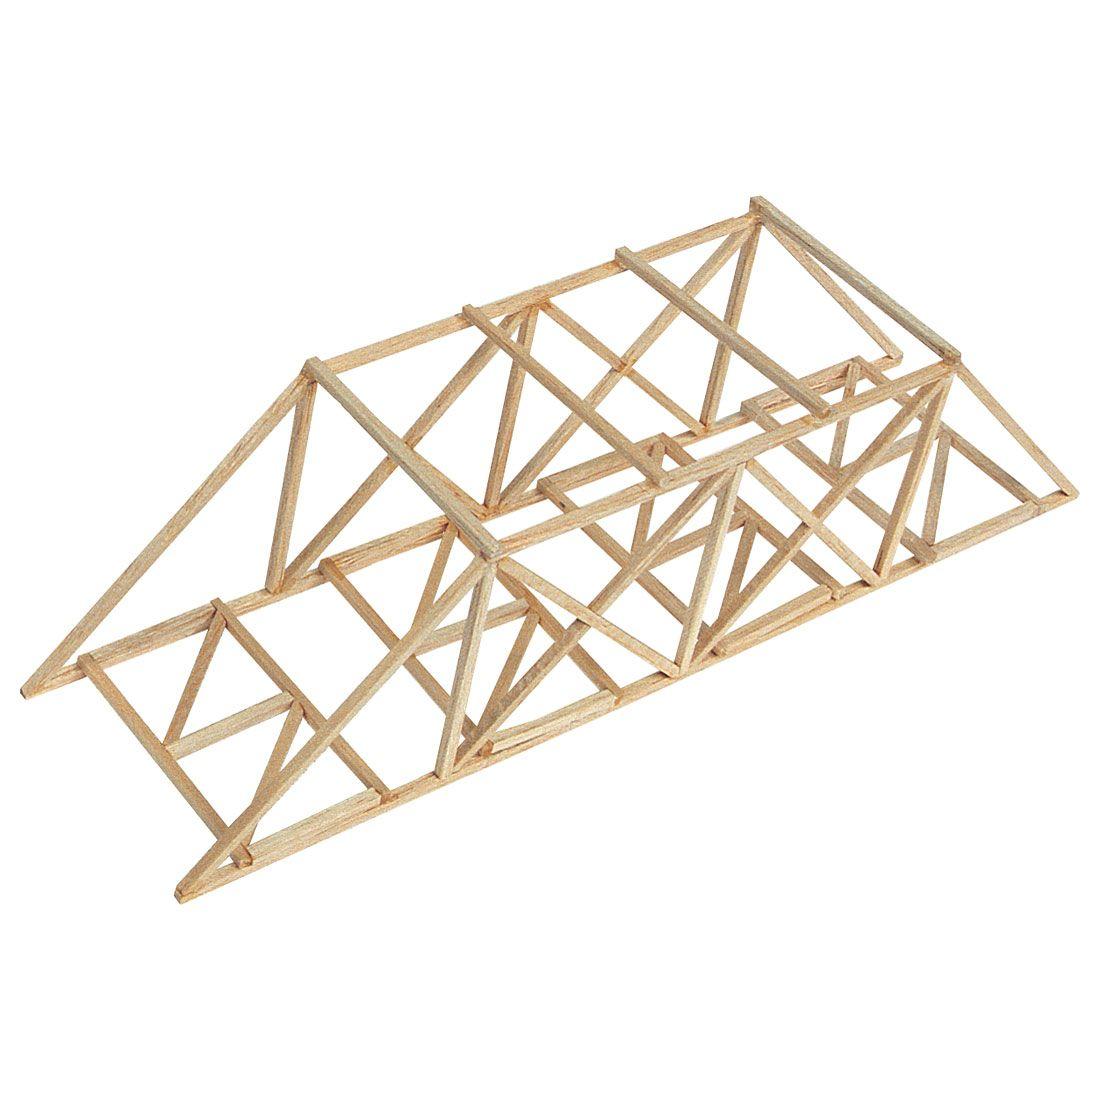 Balsa Bridges Falling Down Falling Down Bridge Design Wood